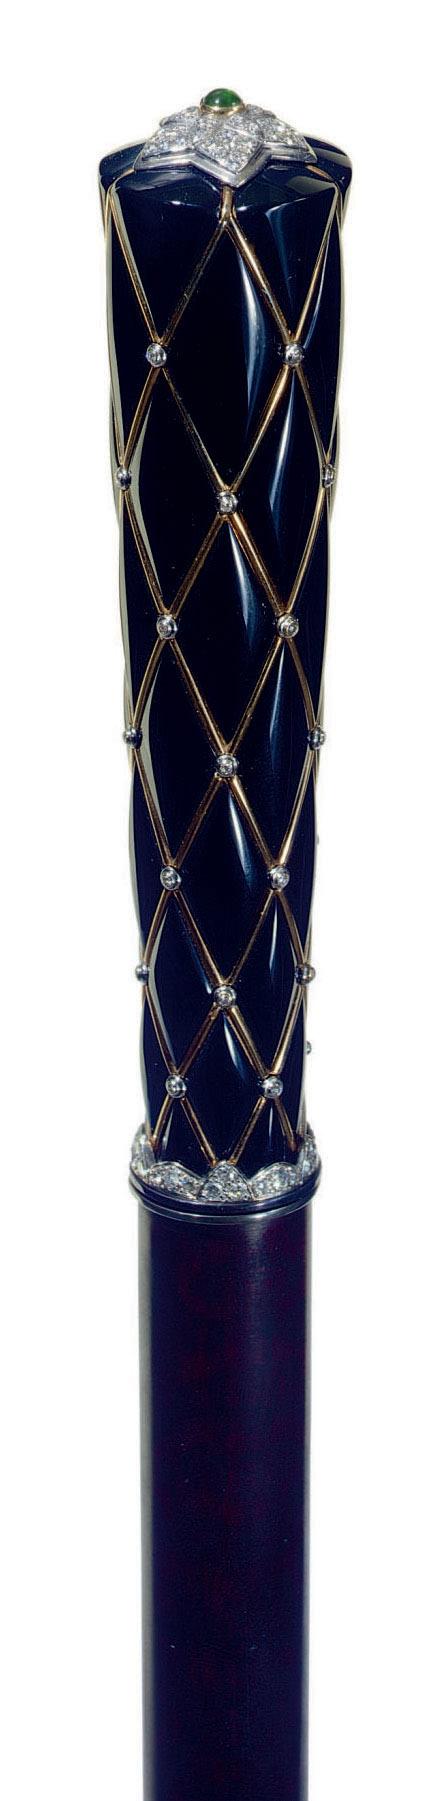 A FRENCH DIAMOND-MOUNTED BLACK